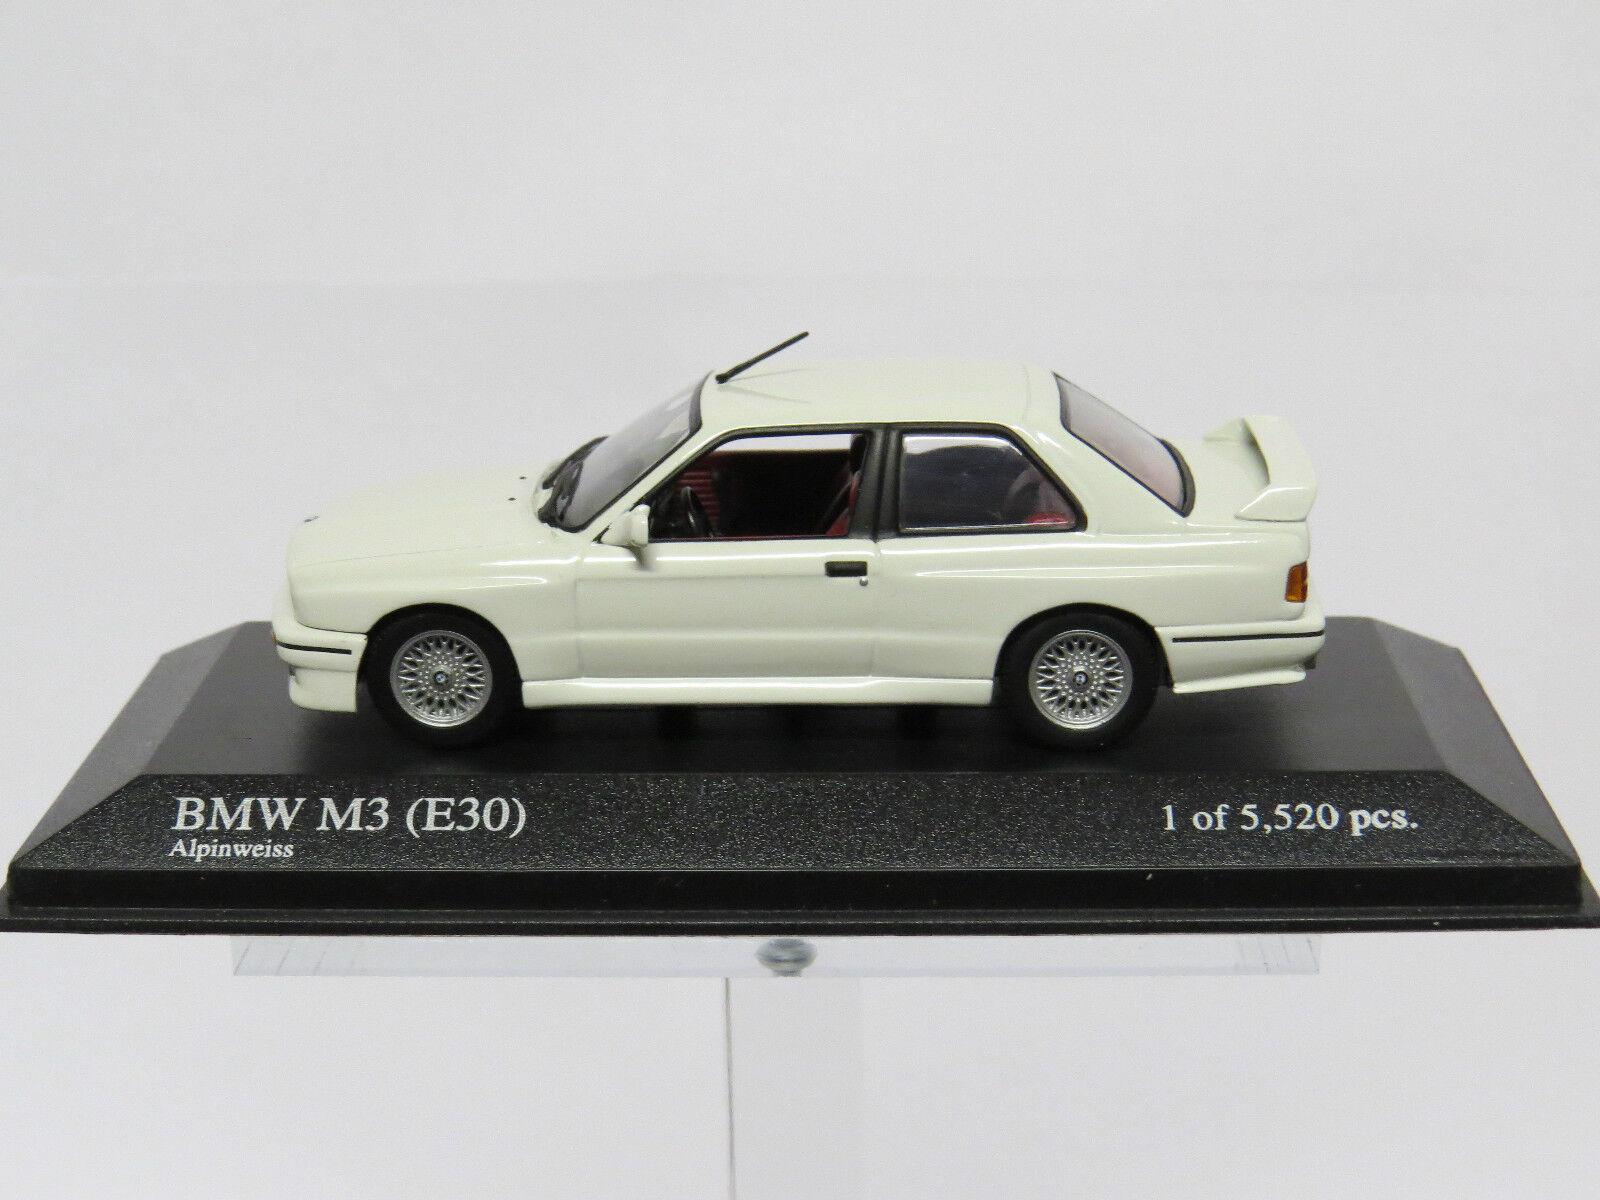 Bmw m3 (e30) 1987 alpinweiss 1   43 430020304 minichamps.